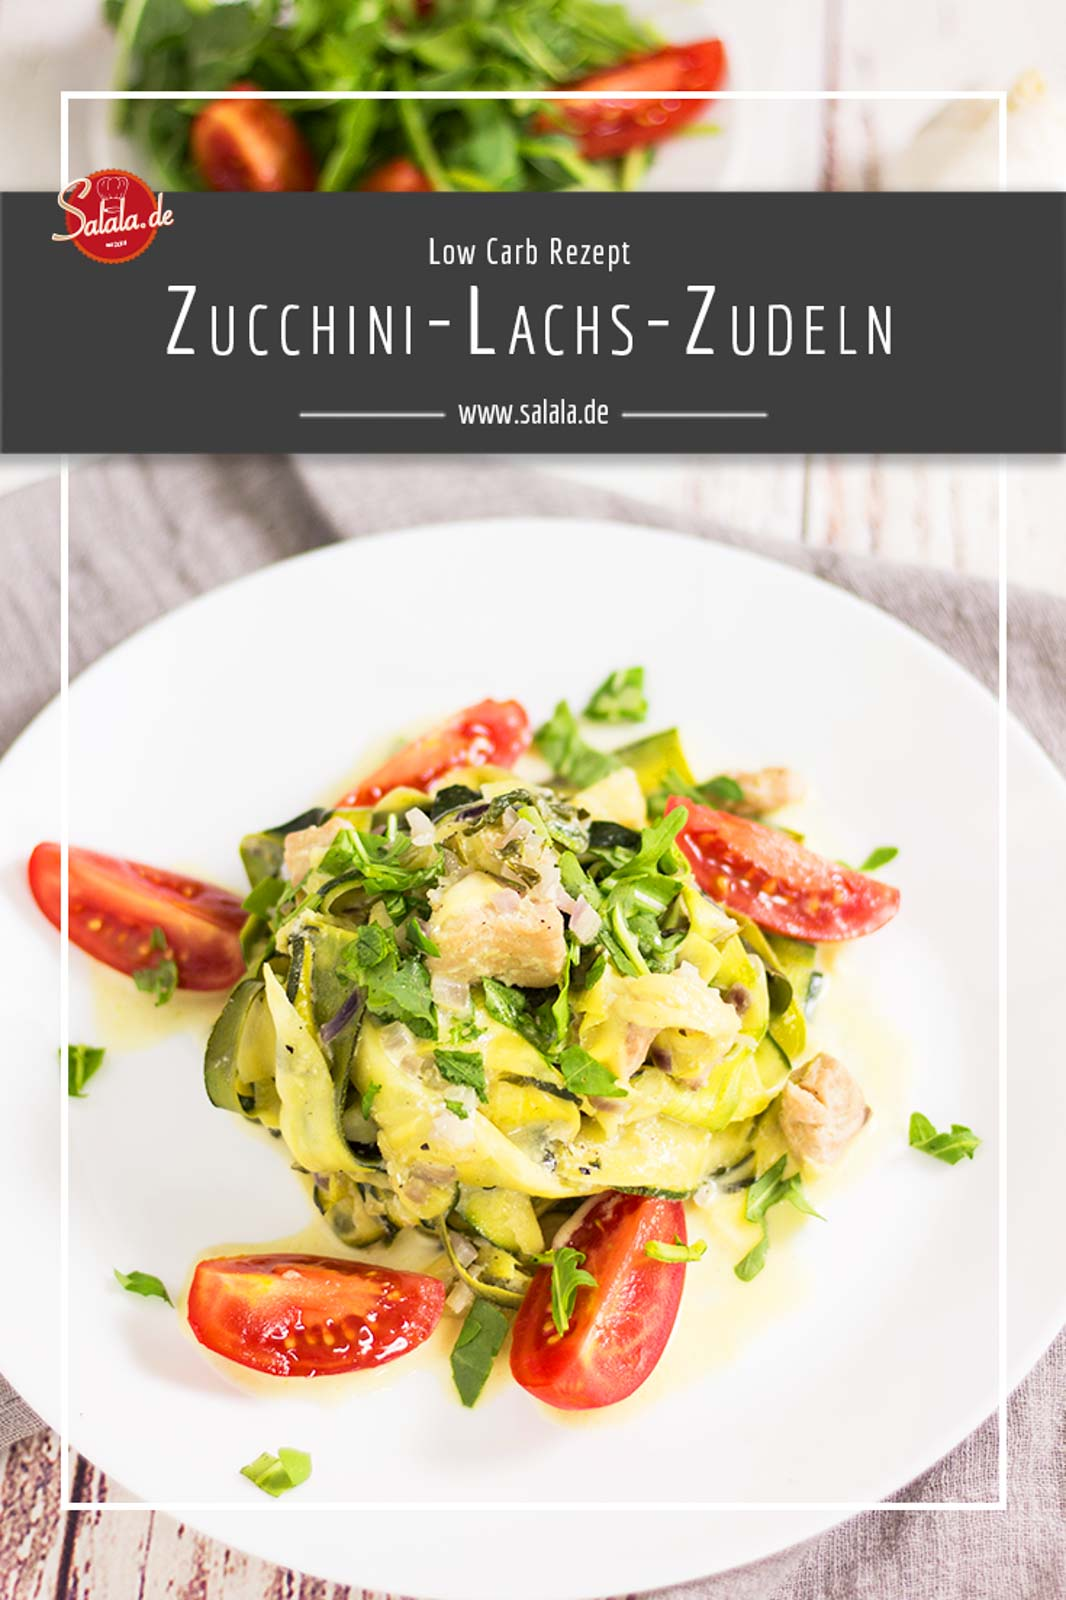 Zucchini Lachs Zudeln - by salala.de - Rezept mit Gemüsenudeln Low Carb Gemüsenudeln Low Carb Pasta #lachszucchinipfanne #gemüsenudeln #zucchninudeln #lowcarb #rezepte #lowcarbrezepte